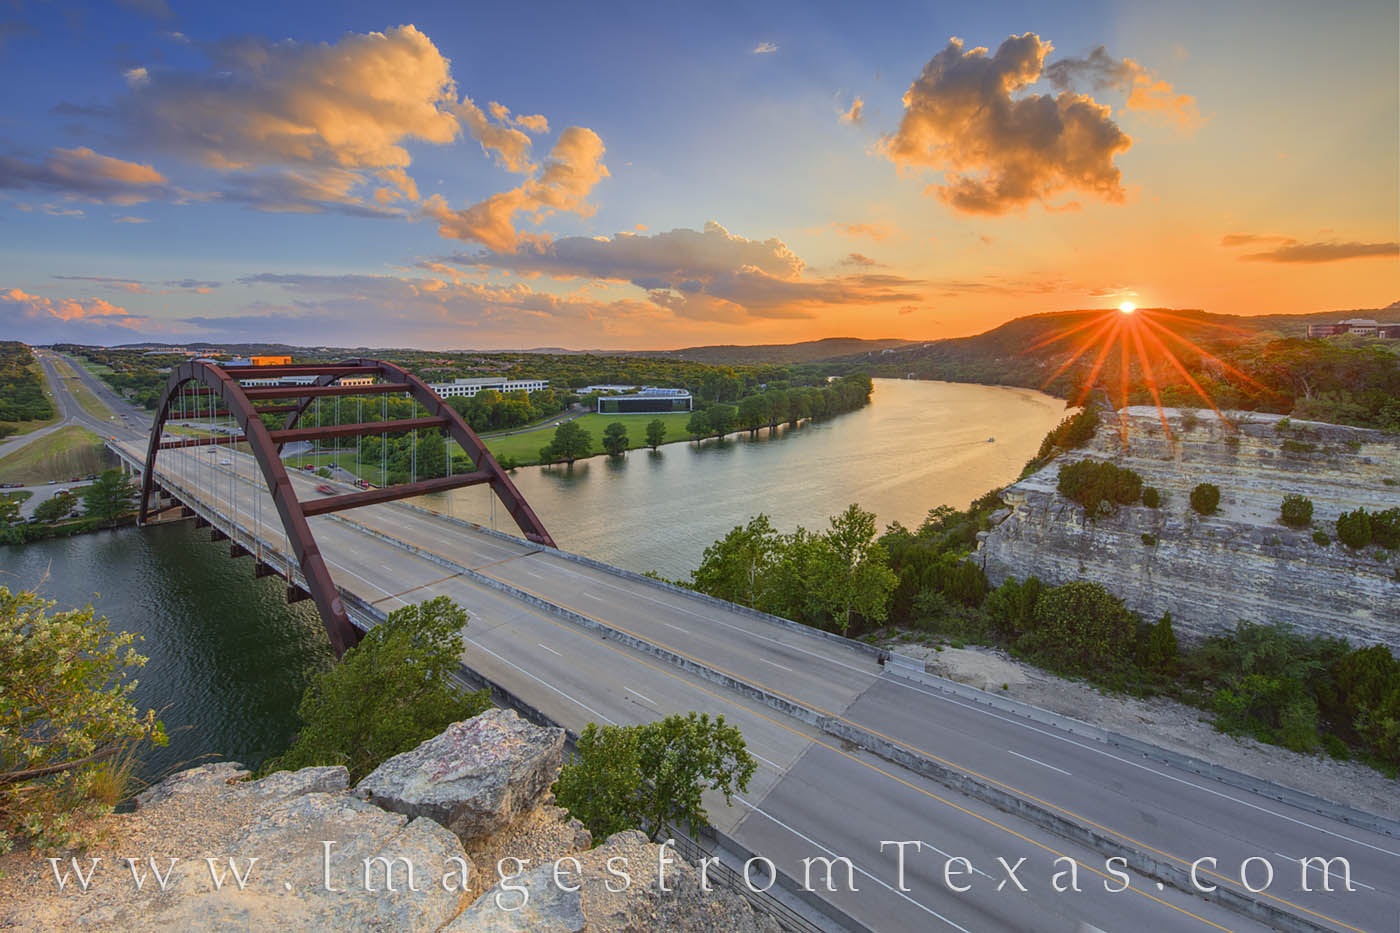 360 Bridge, pennybacker bridge, austin tx, austin overlook, austin icons, colorado river, hill country, sunset, bridges, 360 highway, photo